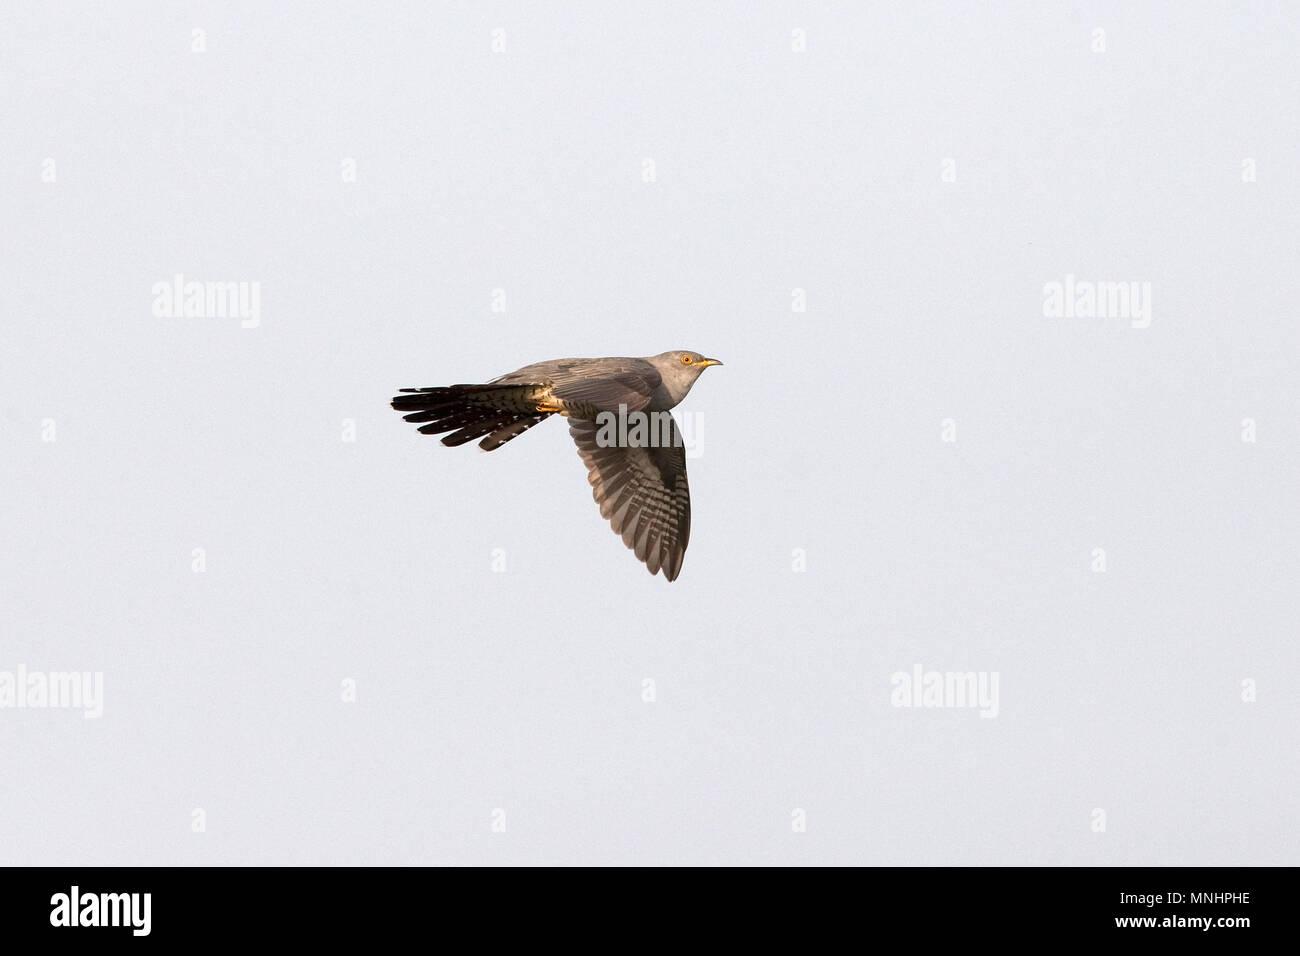 Cuckoo (Cuculus canorus) - Stock Image